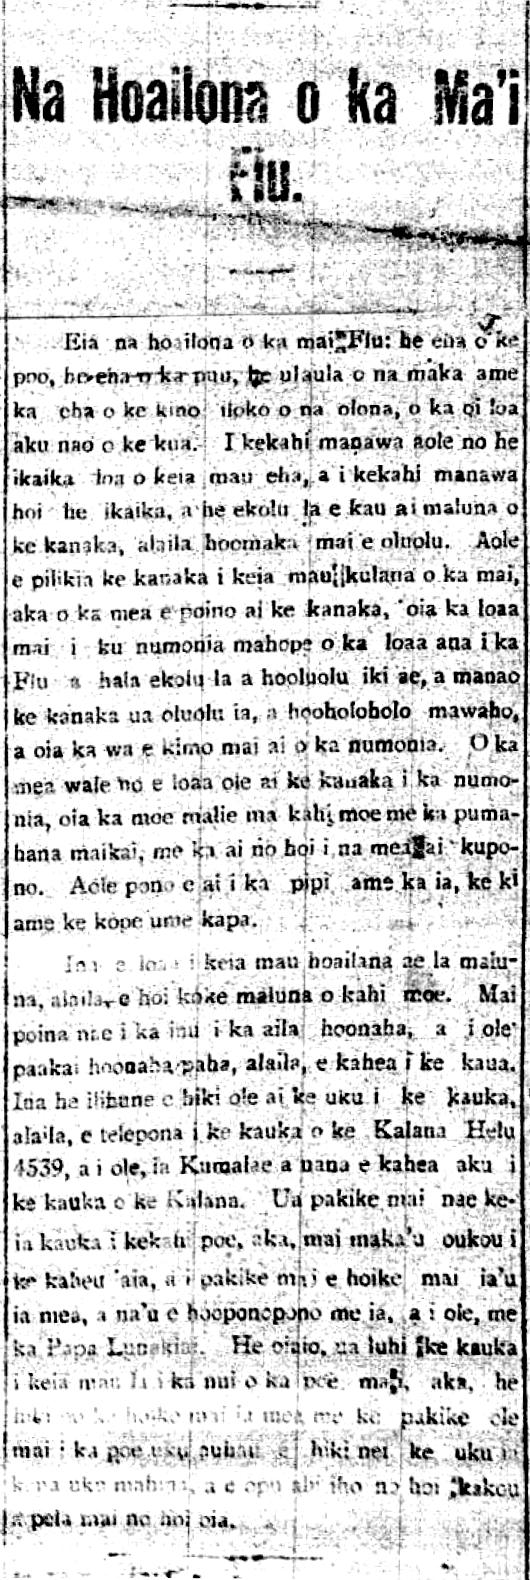 AlakaioHawaii_3_10_1920_1